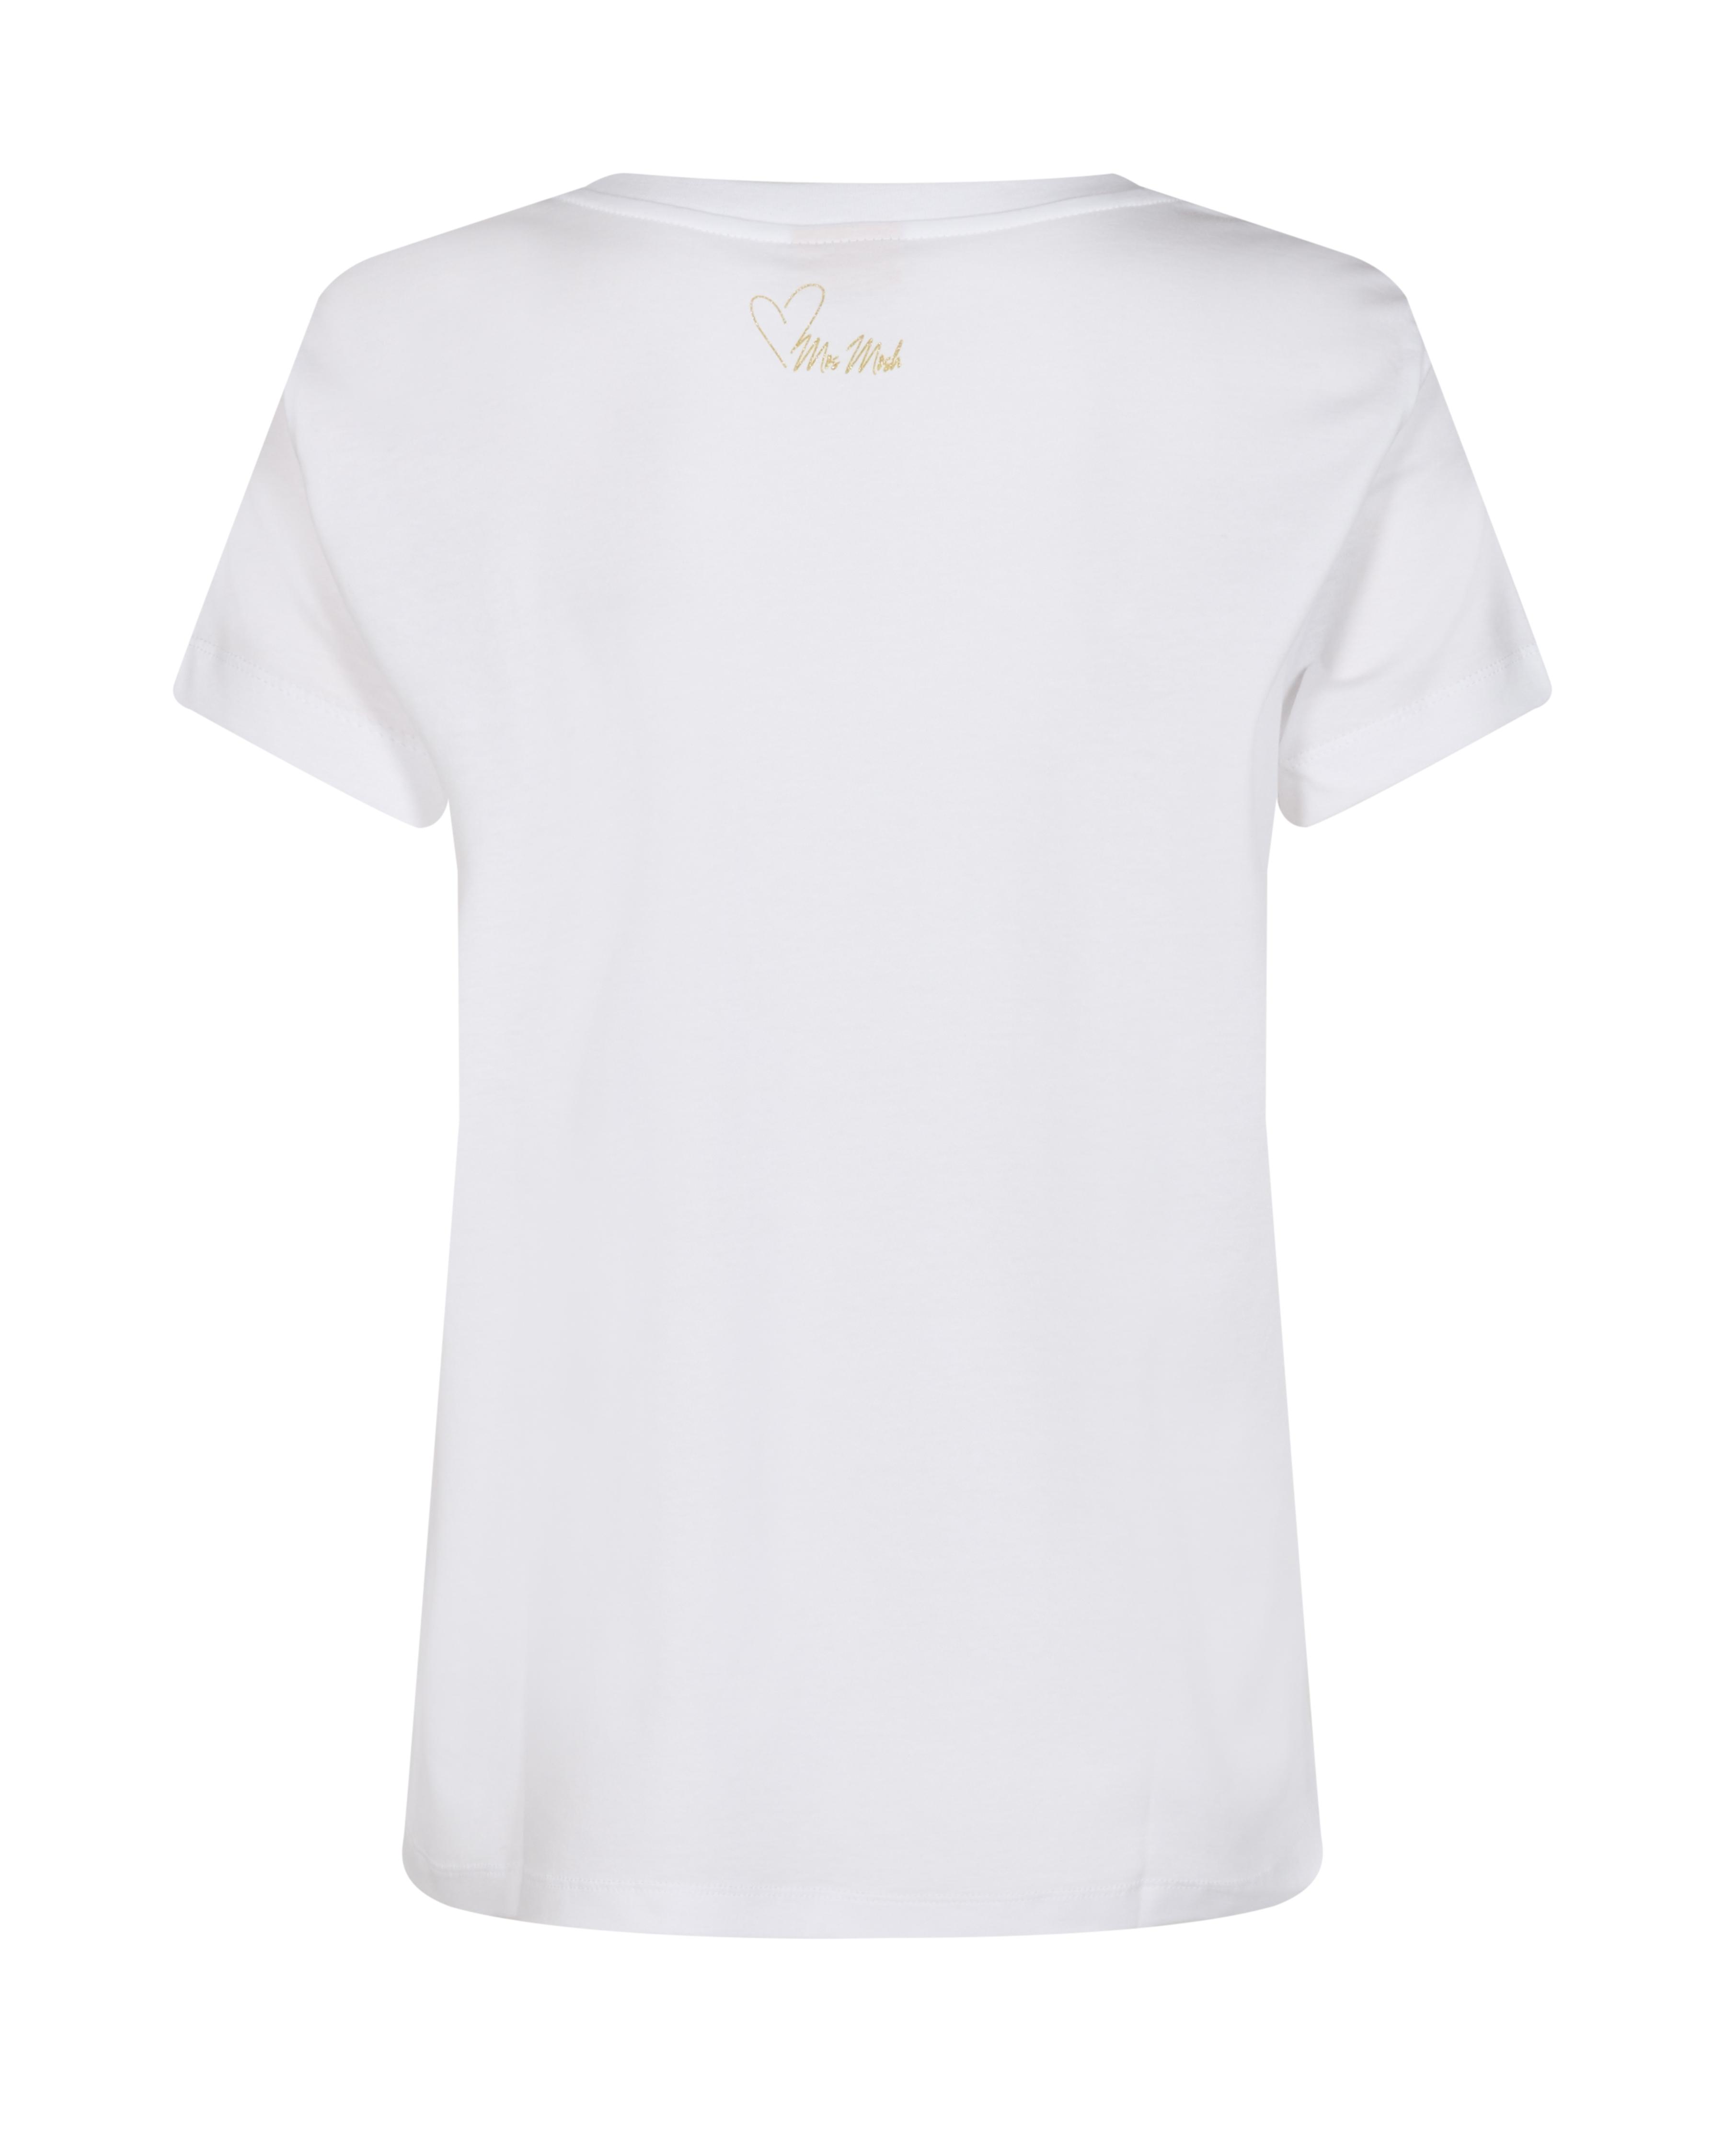 Mos Mosh Cherie t-shirt, winter pear, small